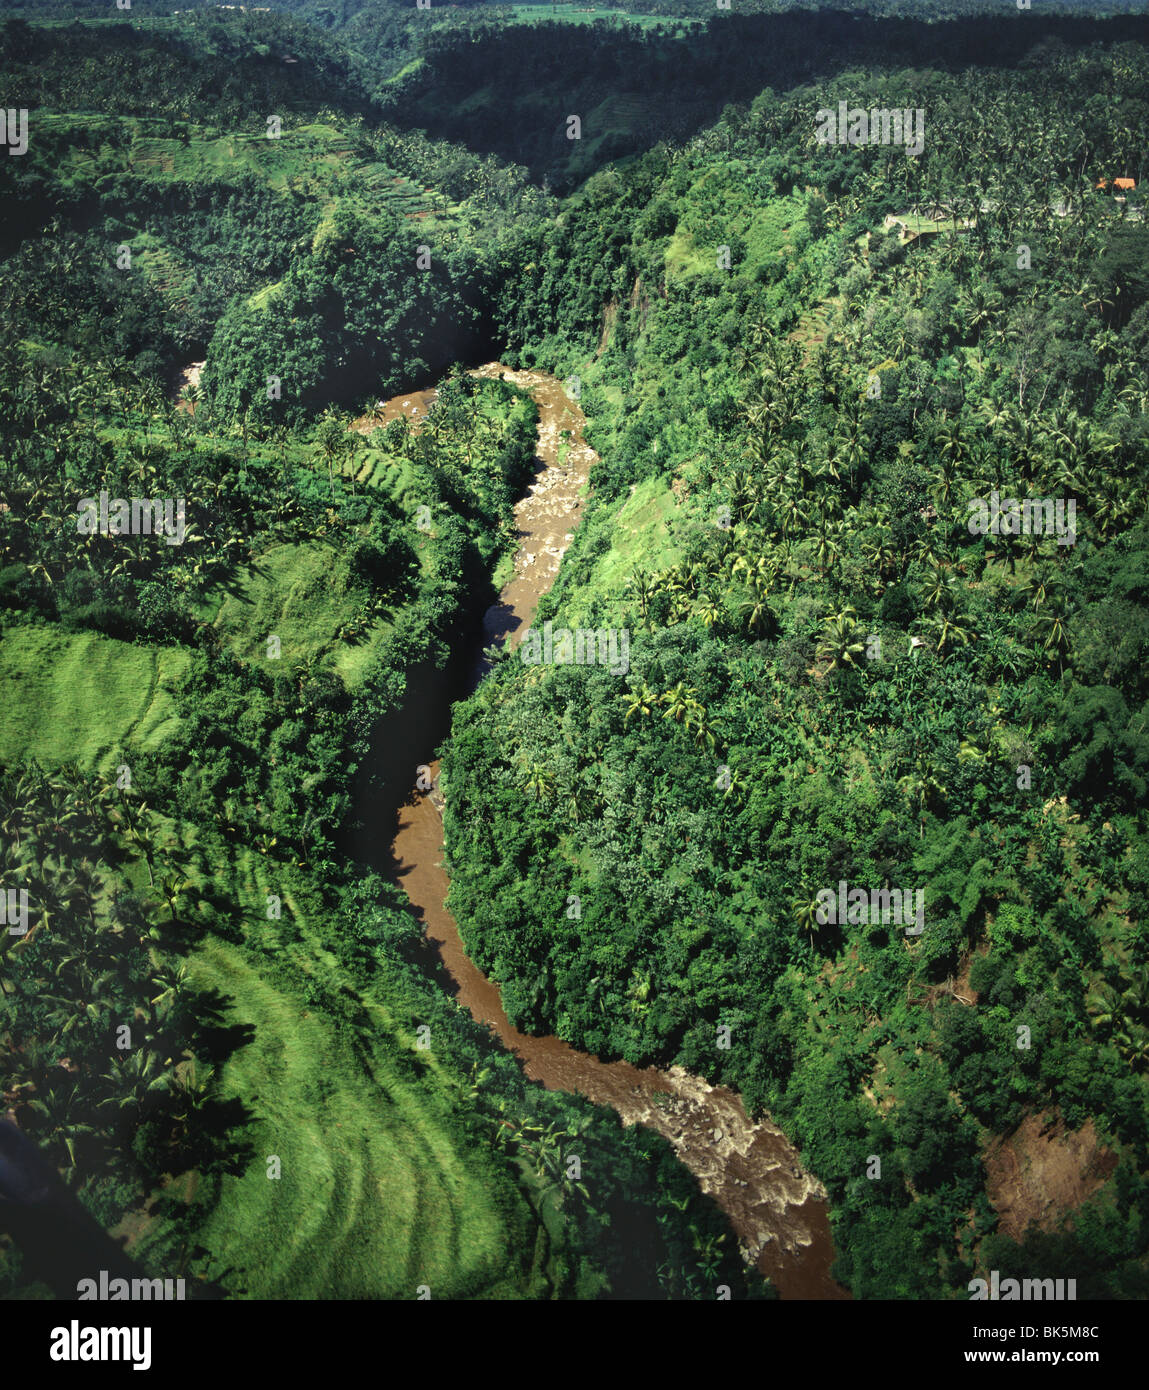 Sayan gorge, Ubud, Bali, Indonesia, Southeast Asia, Asia - Stock Image